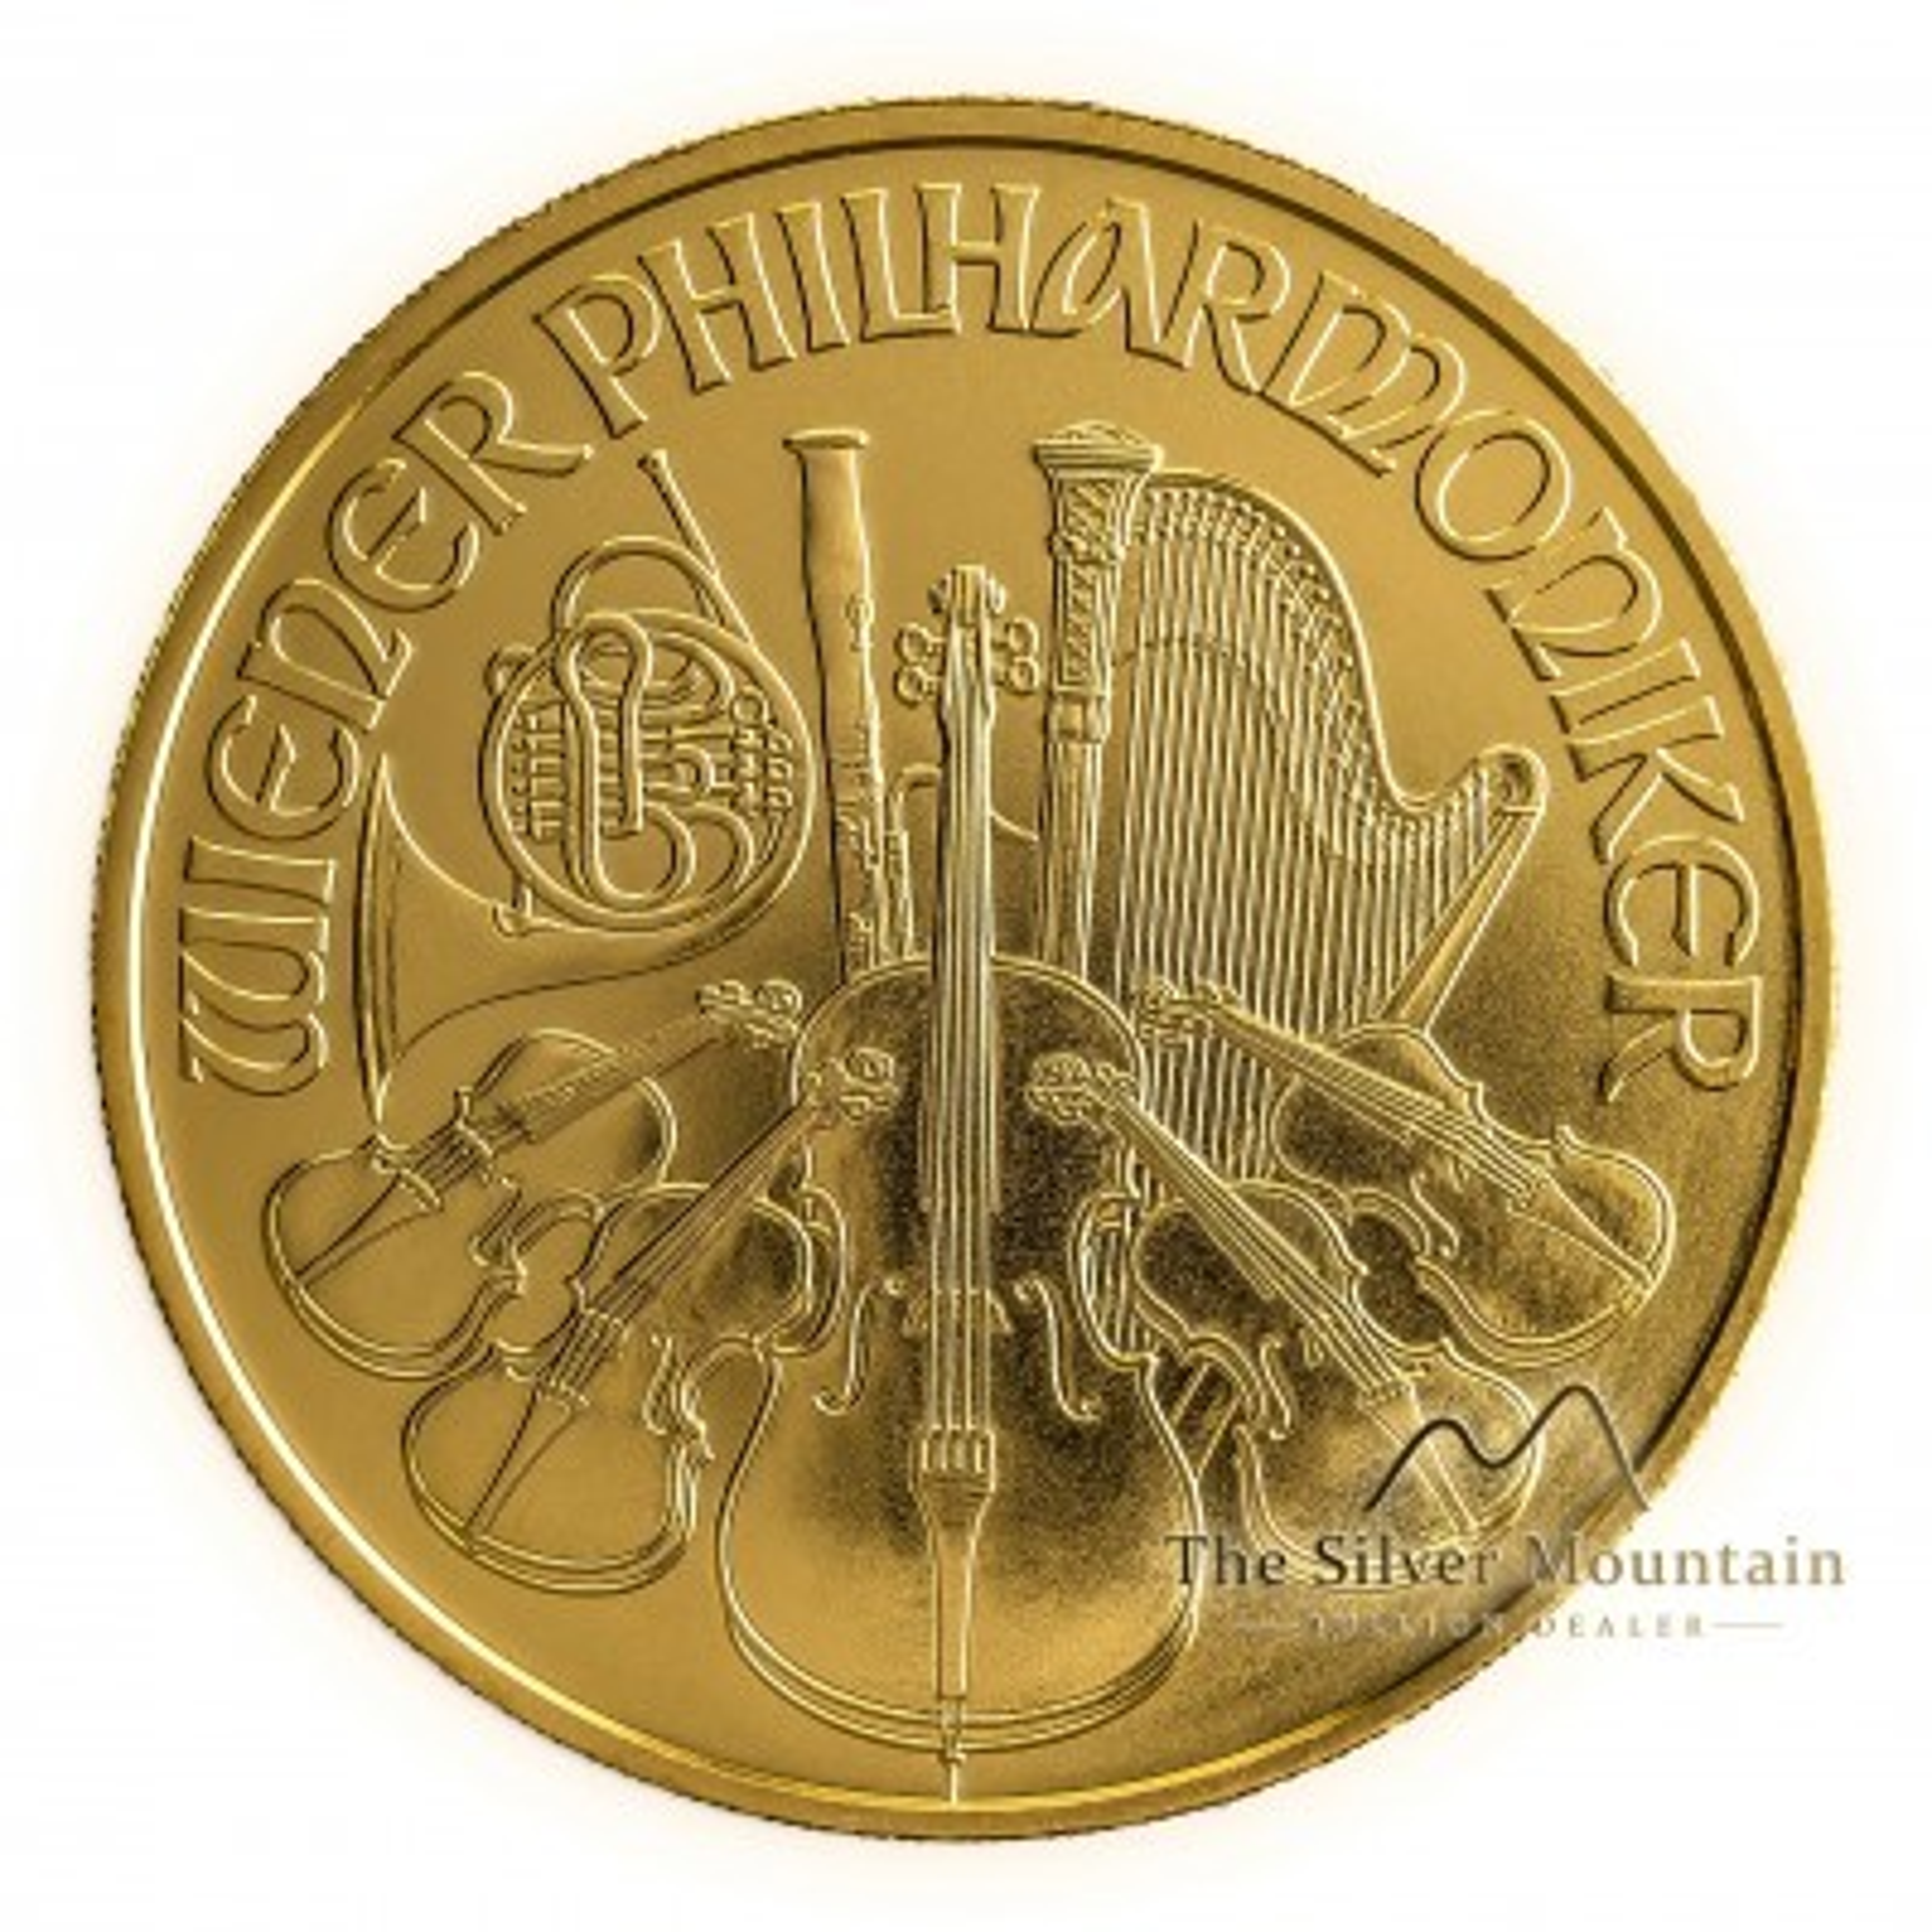 1/2 Troy ounce gold coin Philharmonic 2019